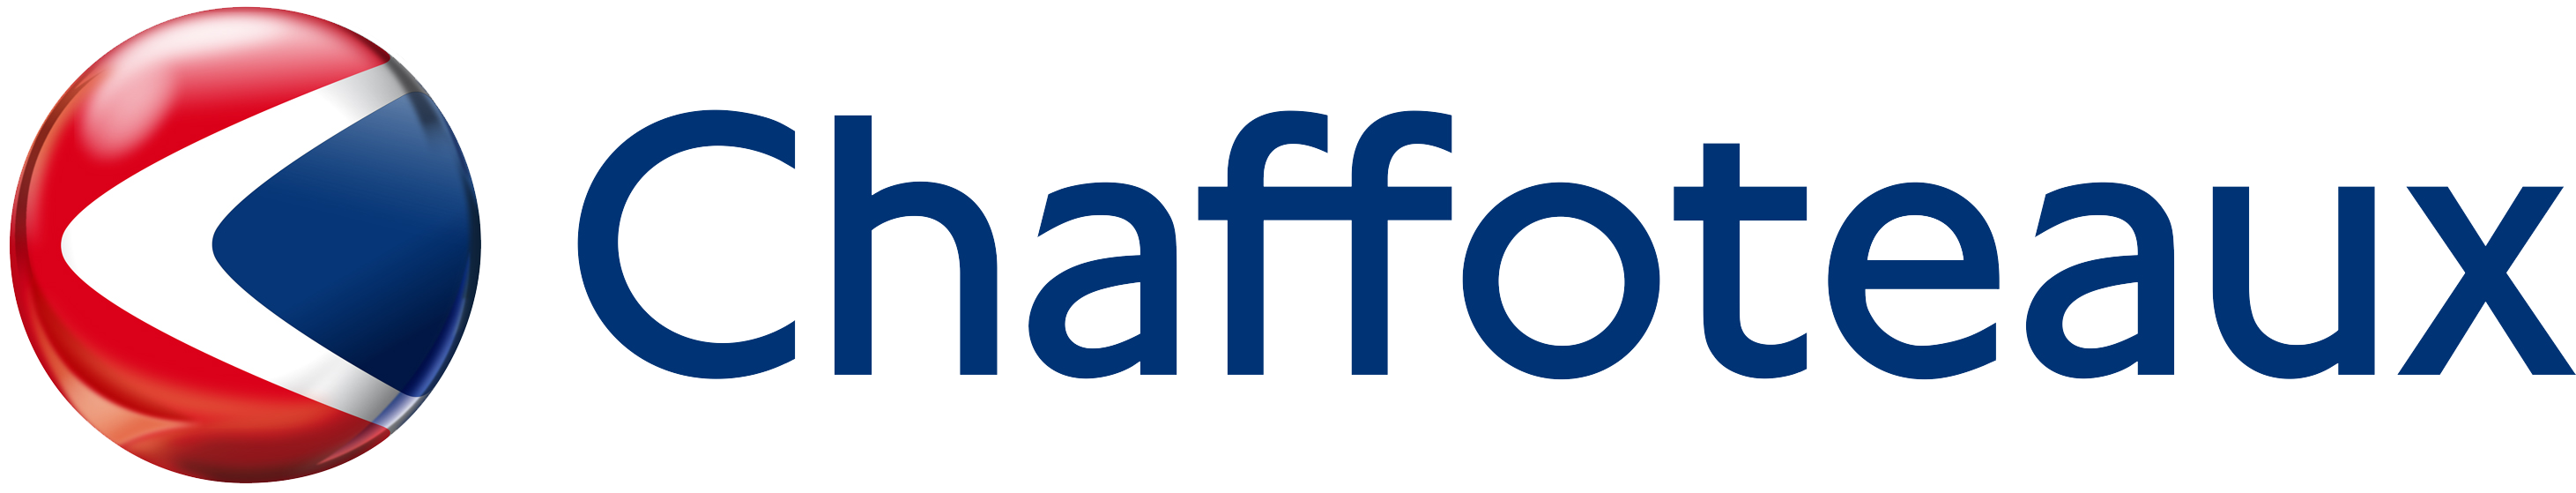 logo-chaffauteaux